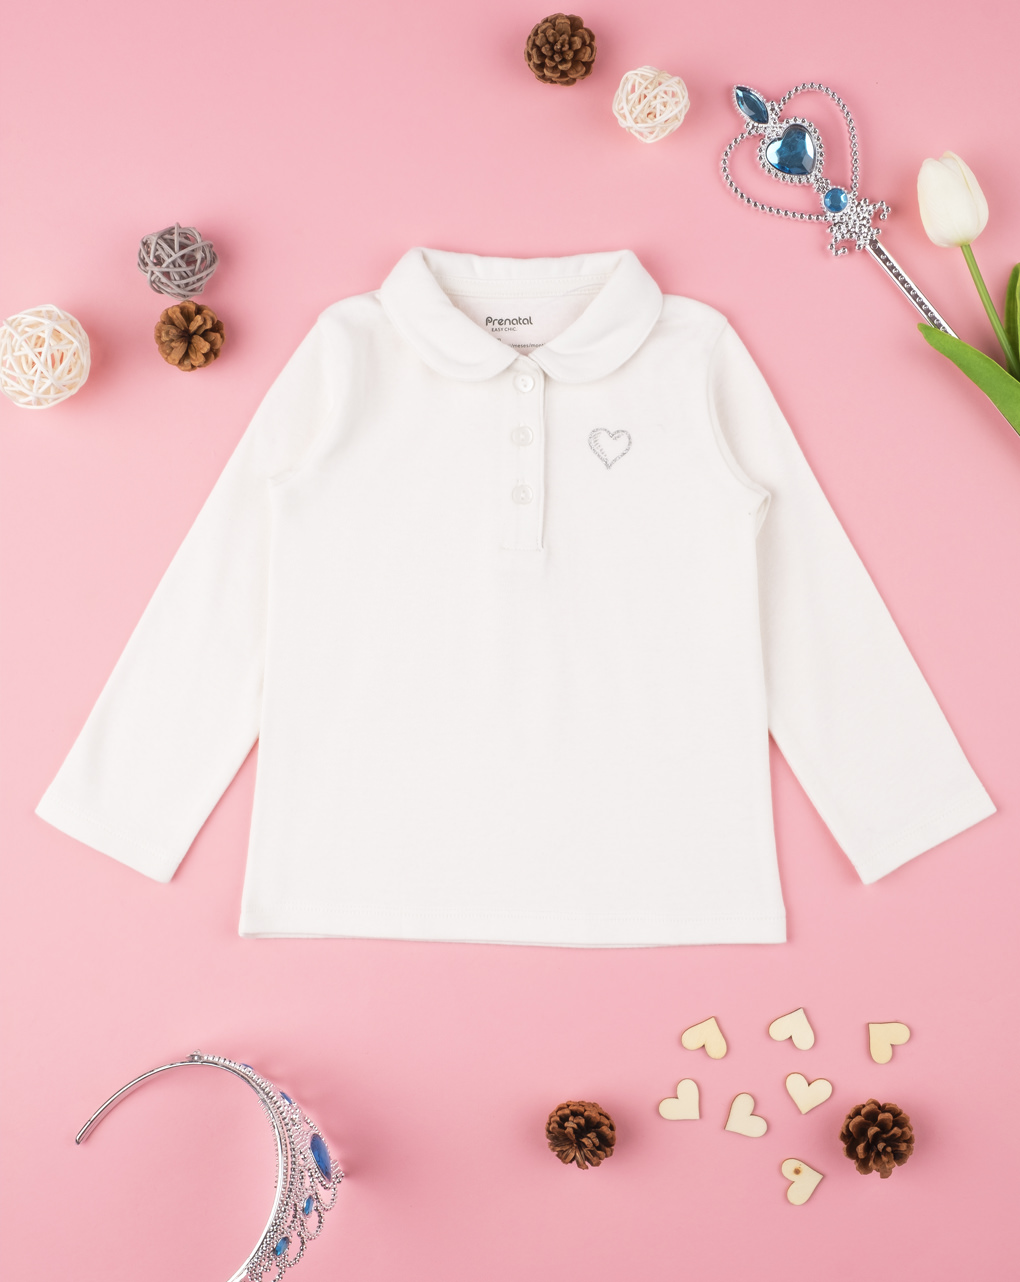 Polo baby girl white - Prénatal